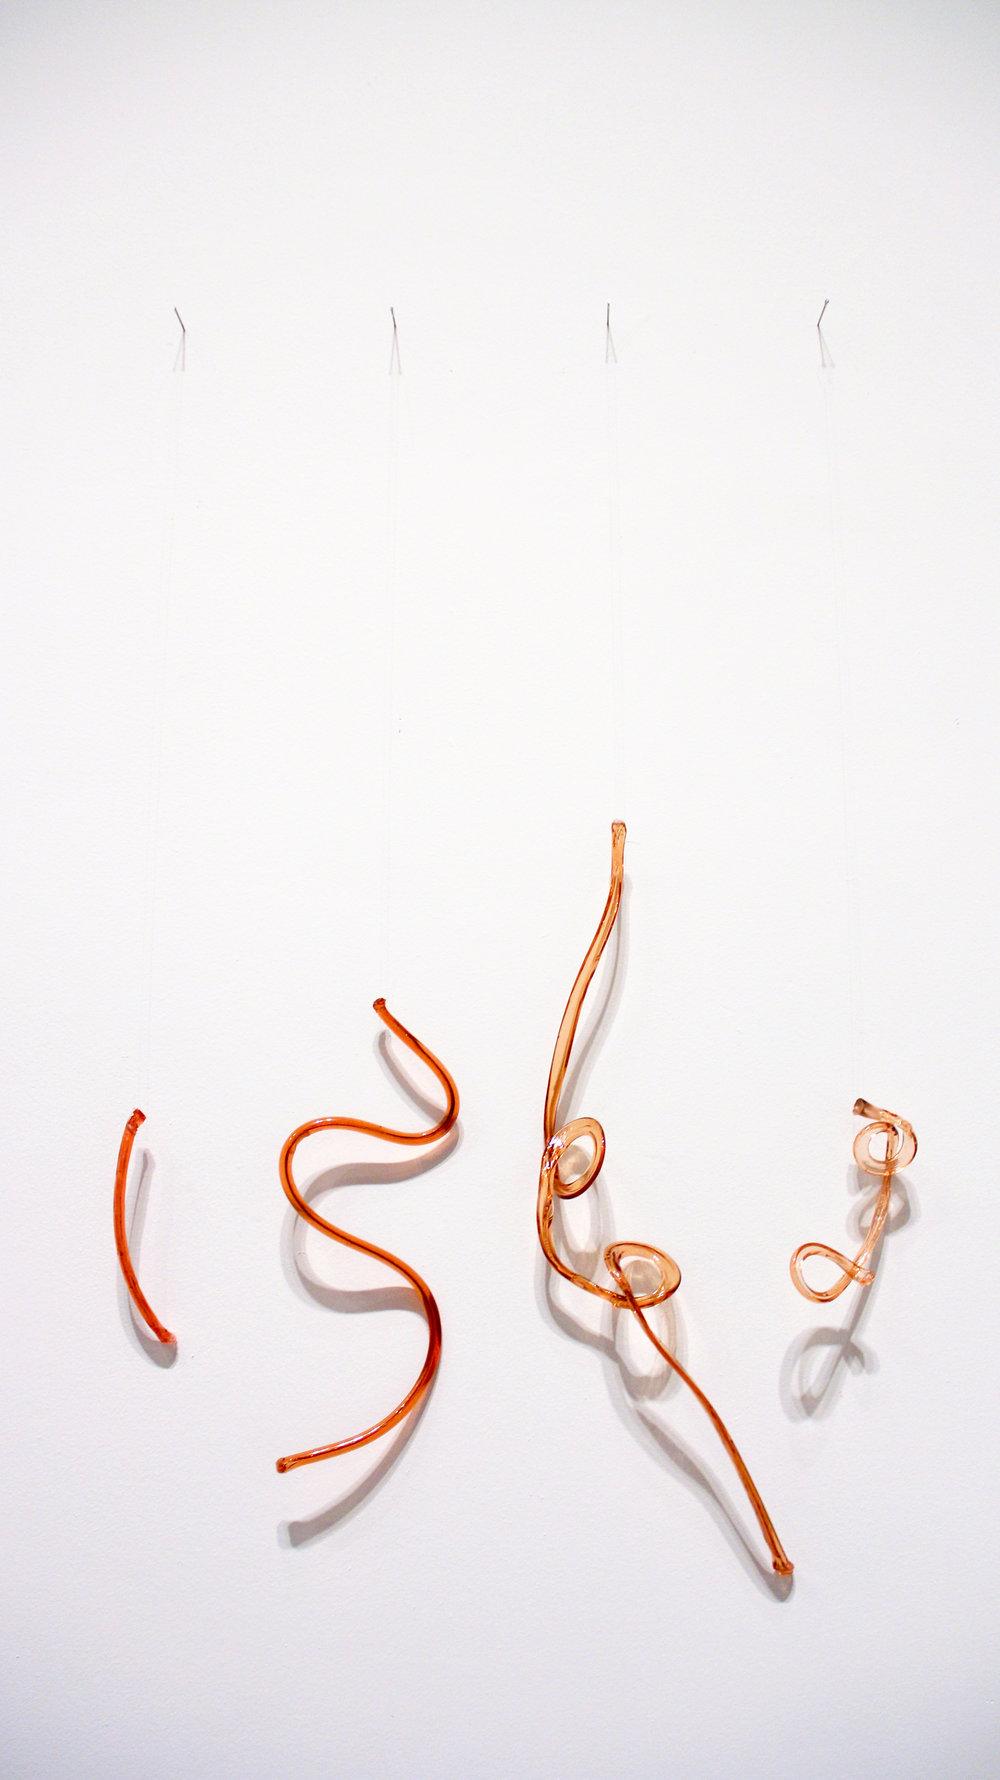 Untitled (rachel, alice, cherry, rebecca, chloe, logan, linda, max, alex, leah, elias)